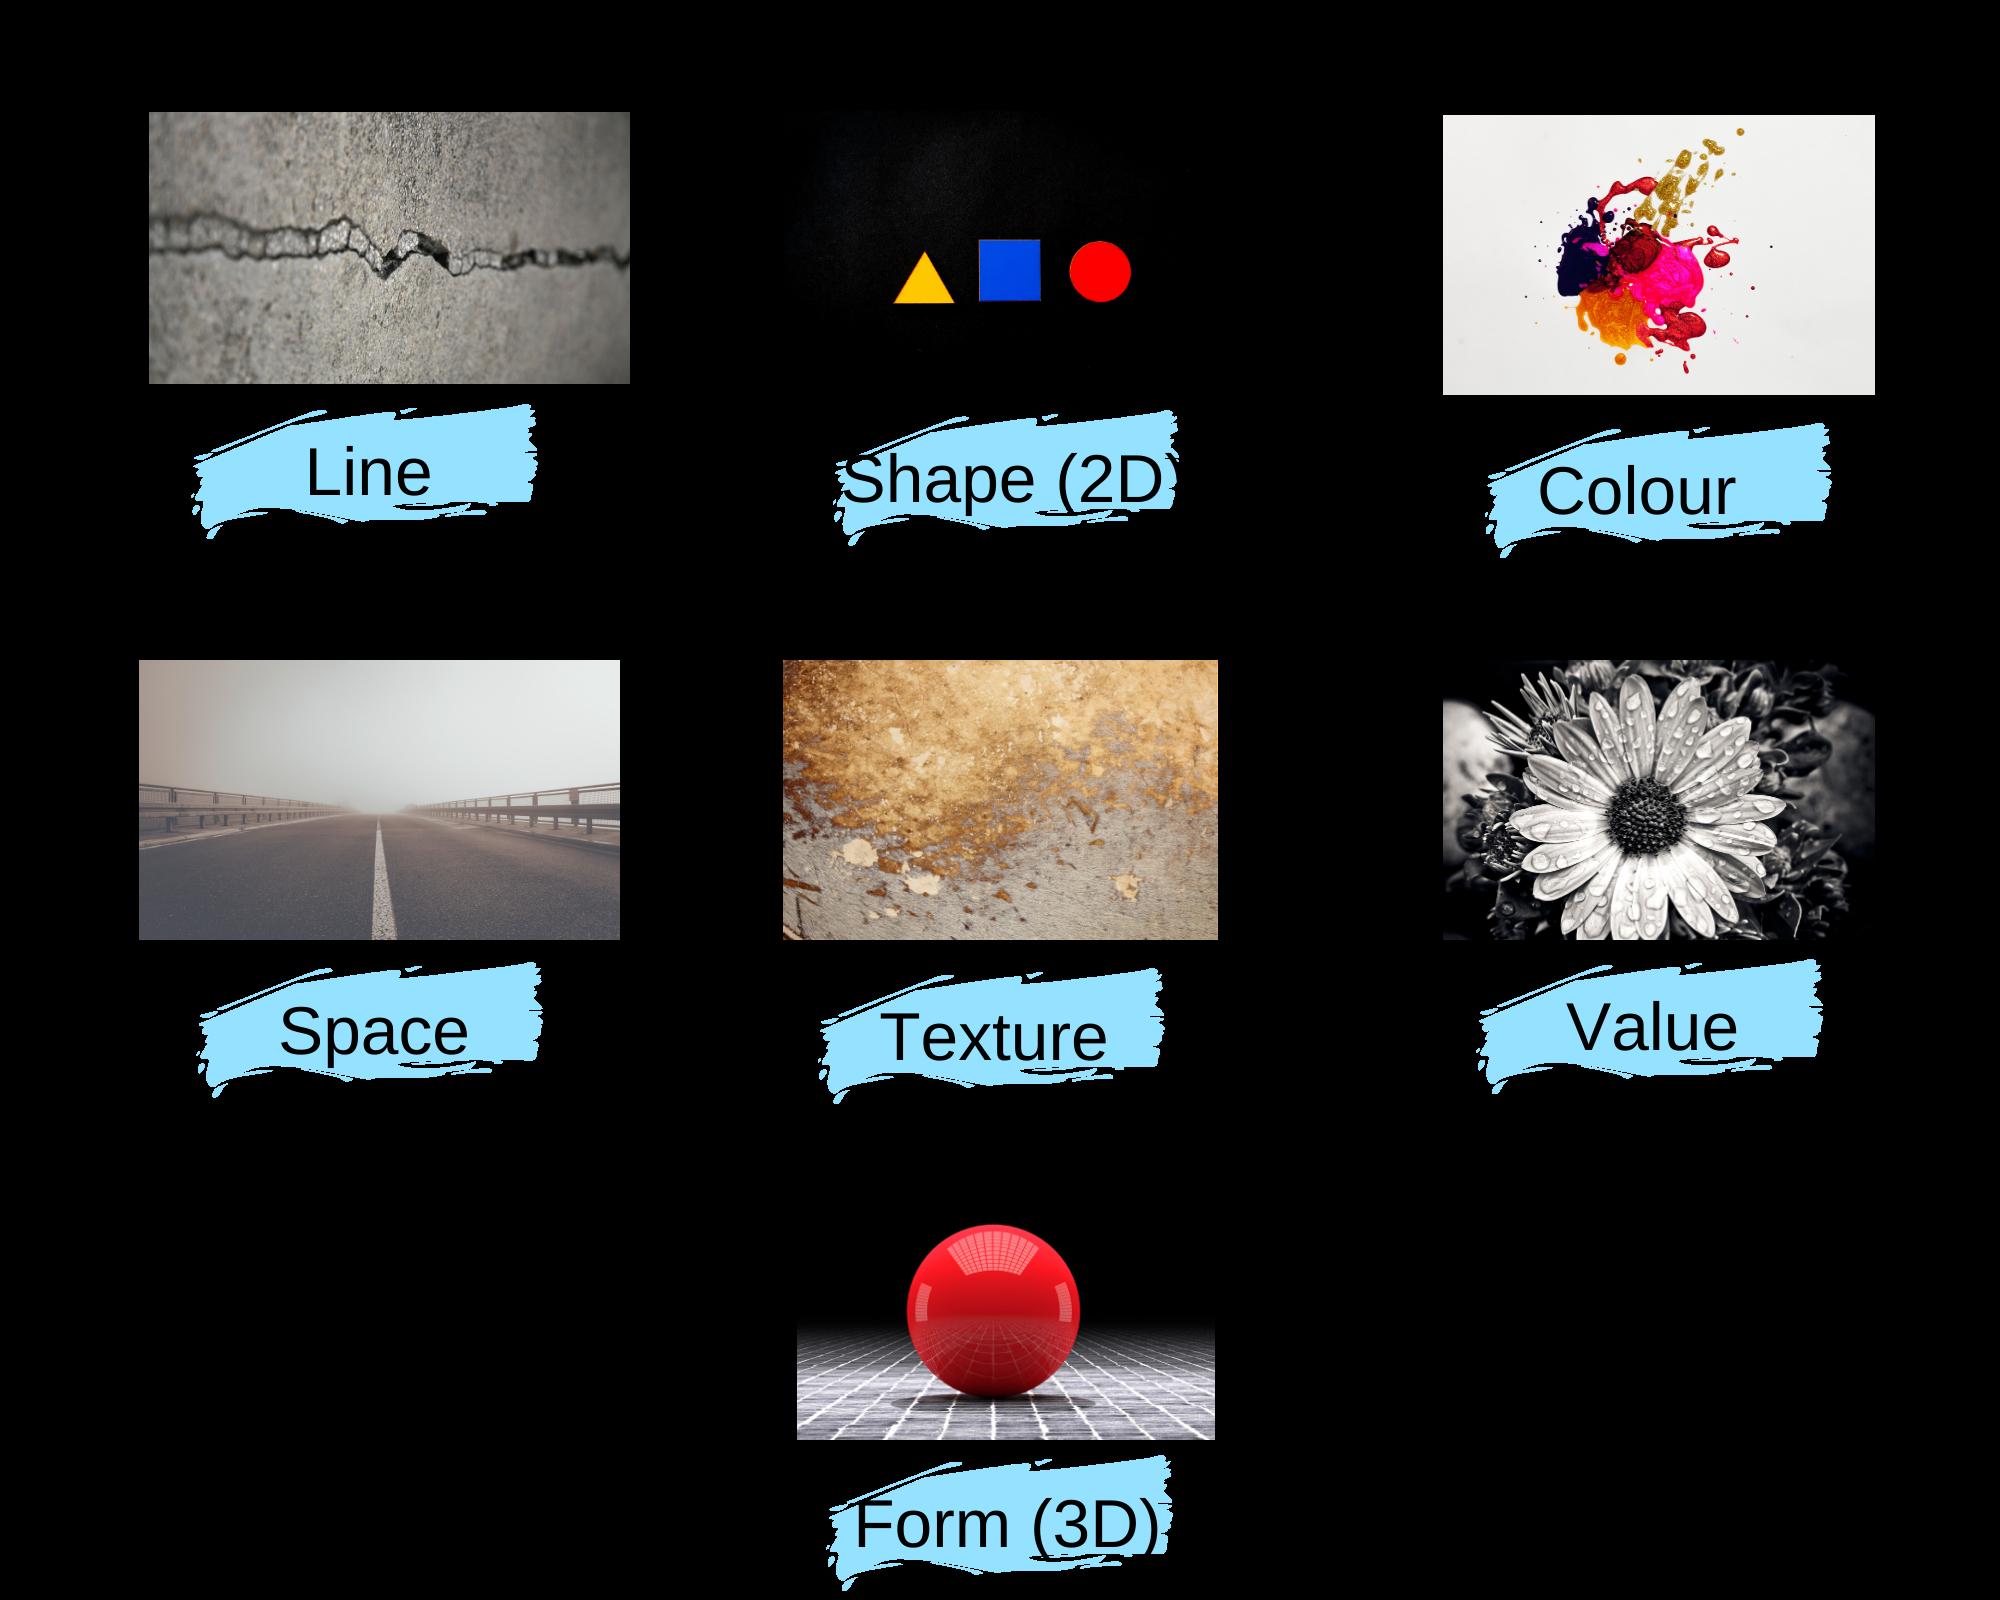 7 visual elements